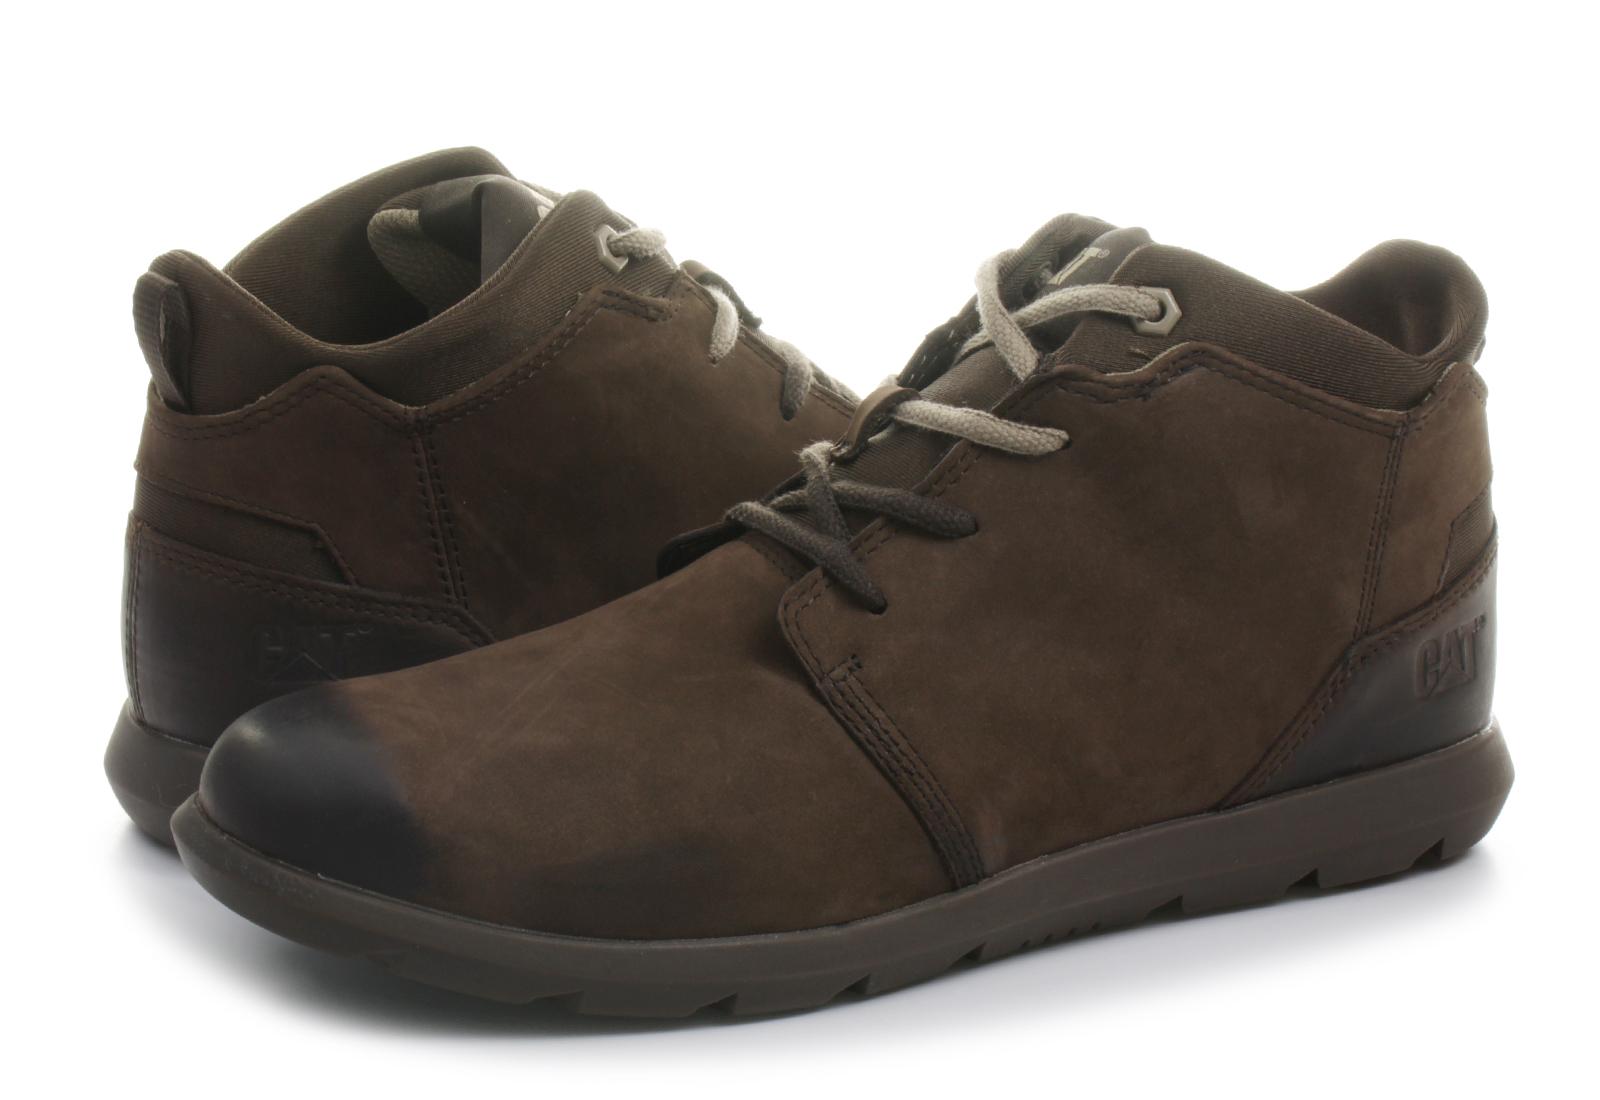 Cat Cipő - Transcend - 718990-cho - Office Shoes Magyarország 5c57b6524f